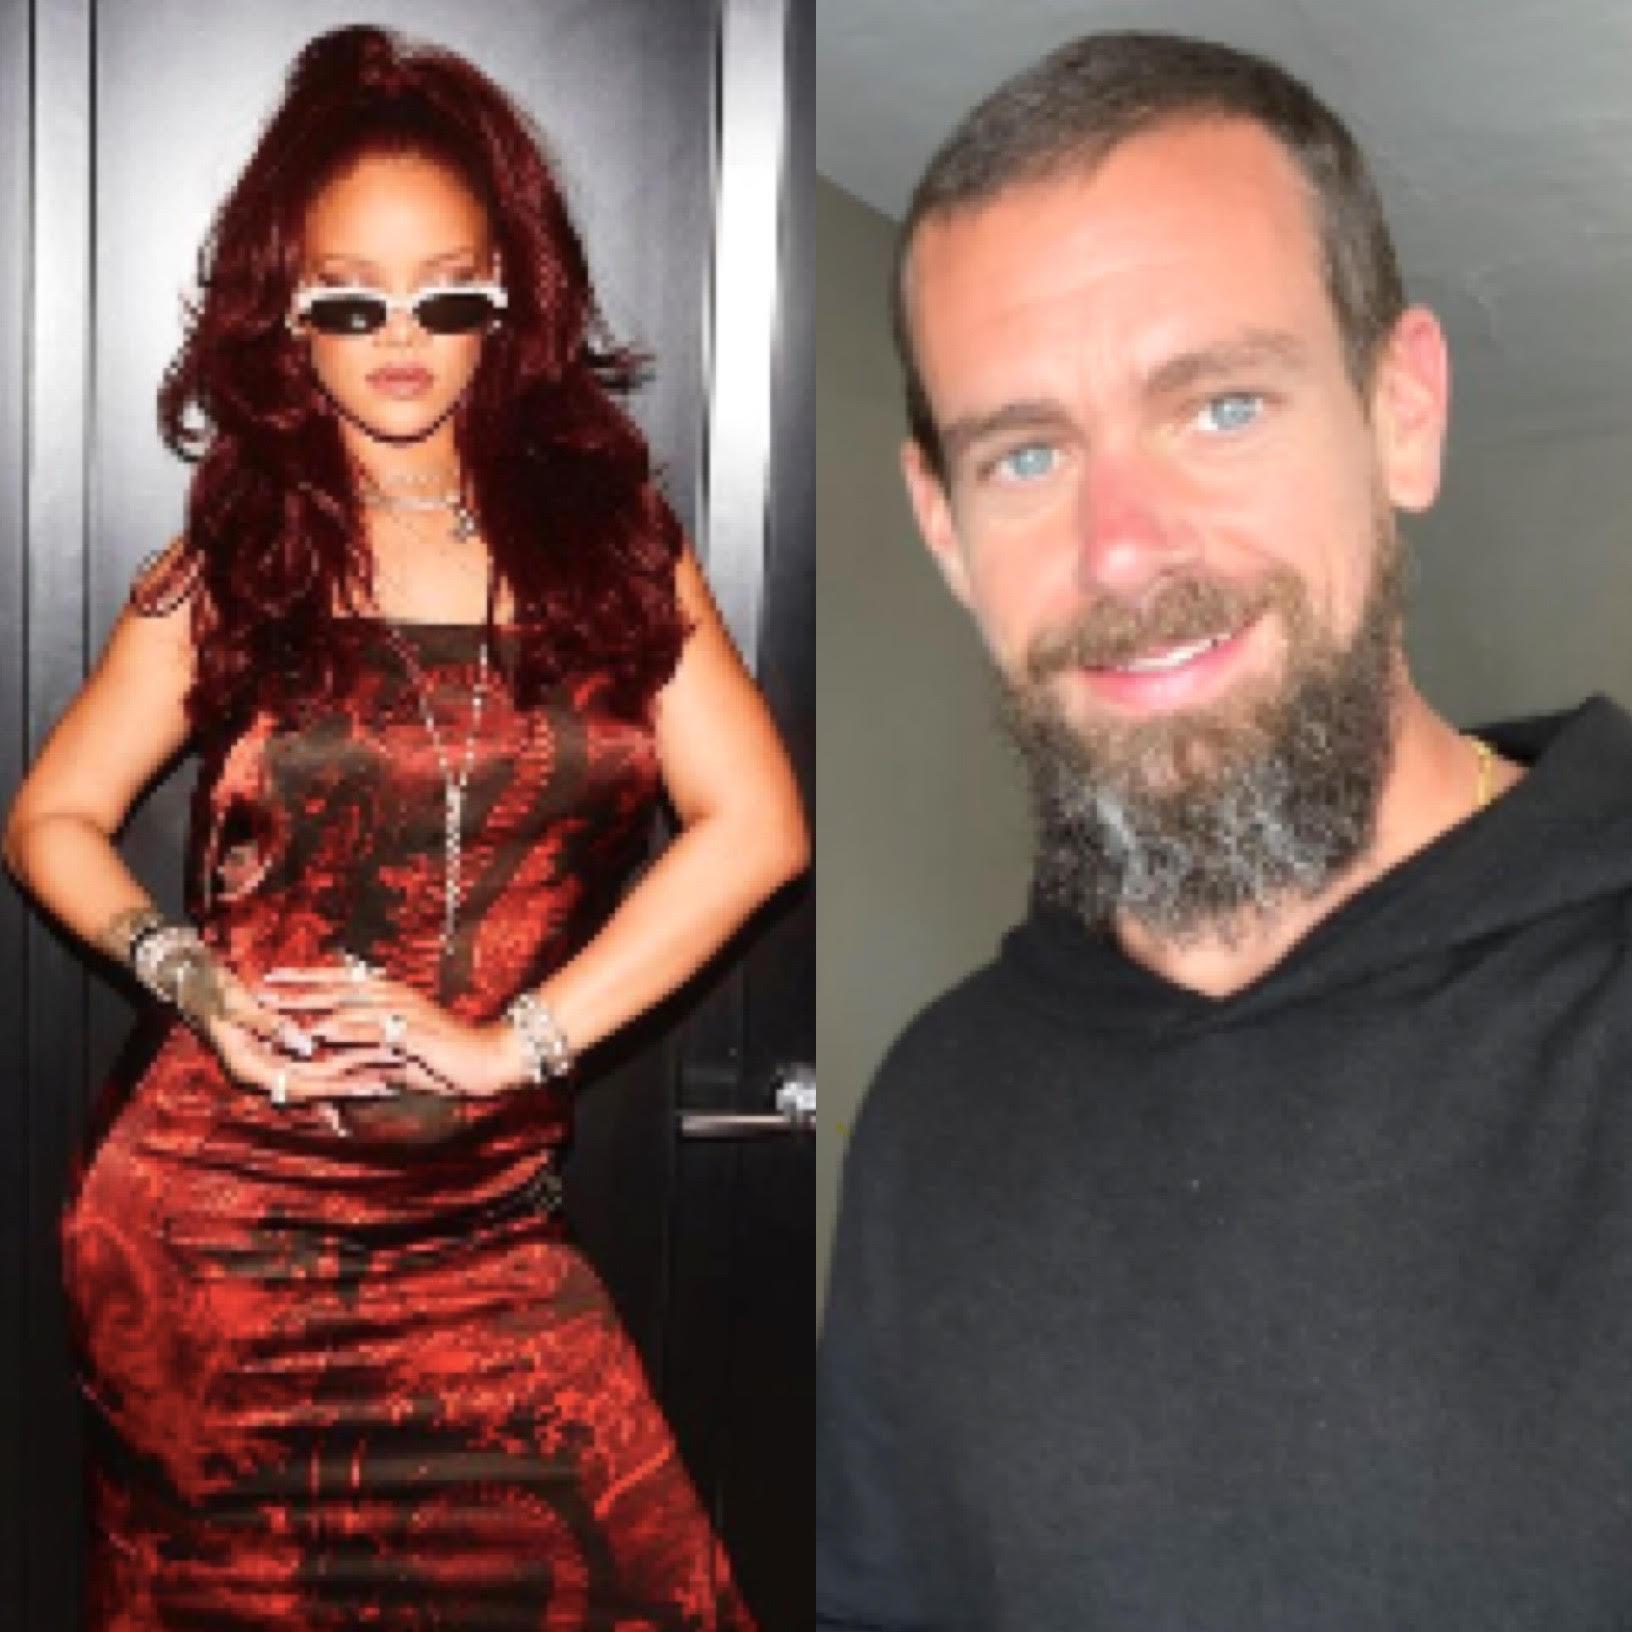 Rihanna Twitter Founder Jack Dorsey Donate 4 2 Million To Domestic Violence Program Thejasminebrand